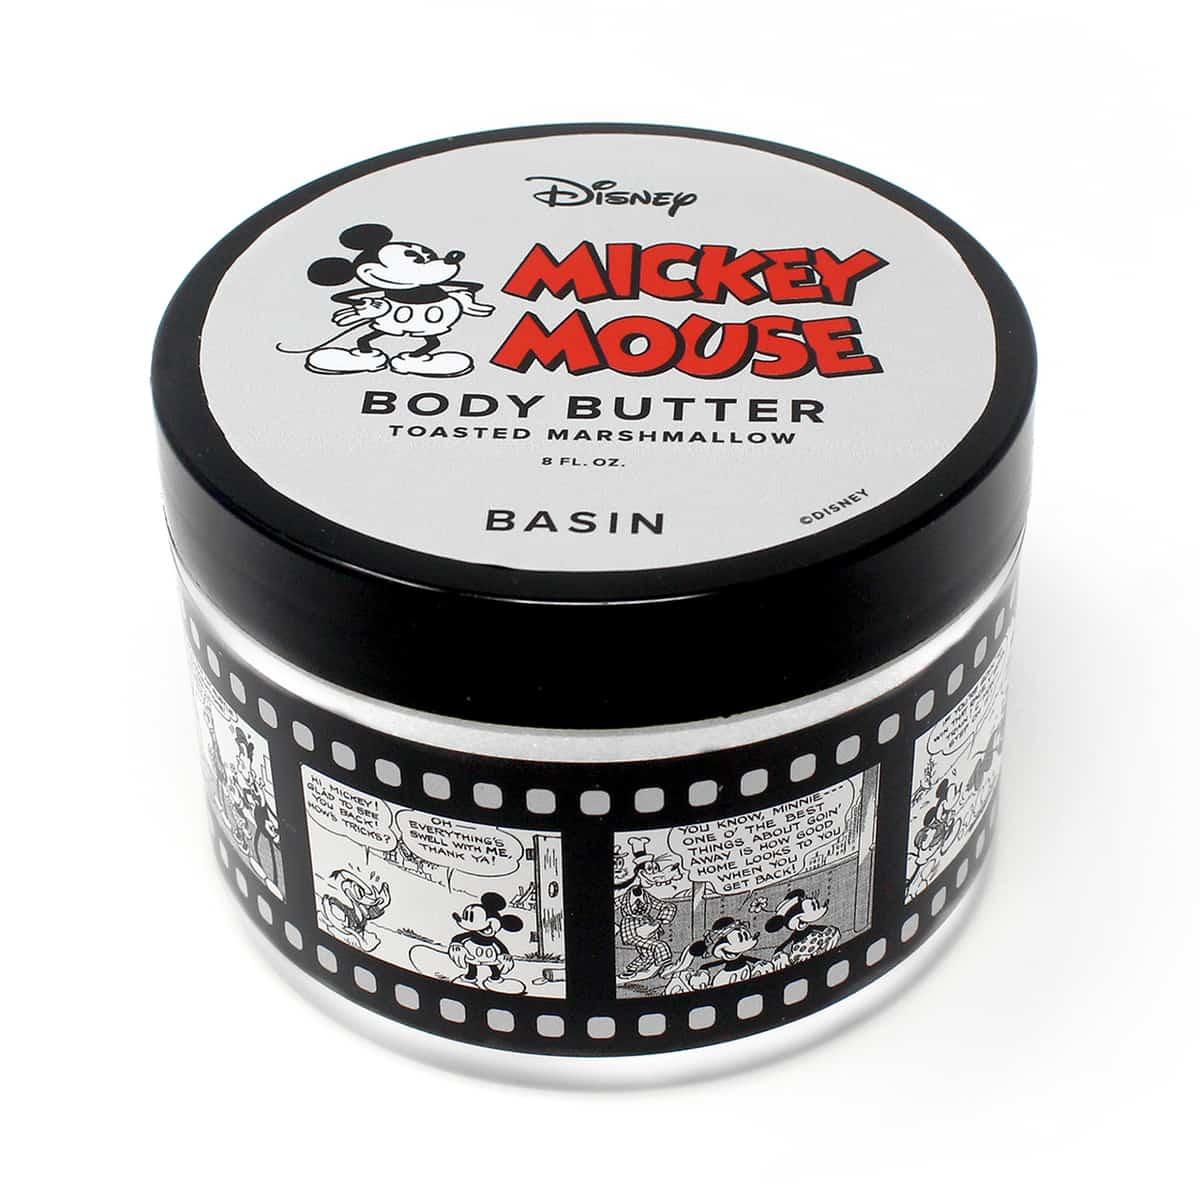 Disney Basin Body Butter